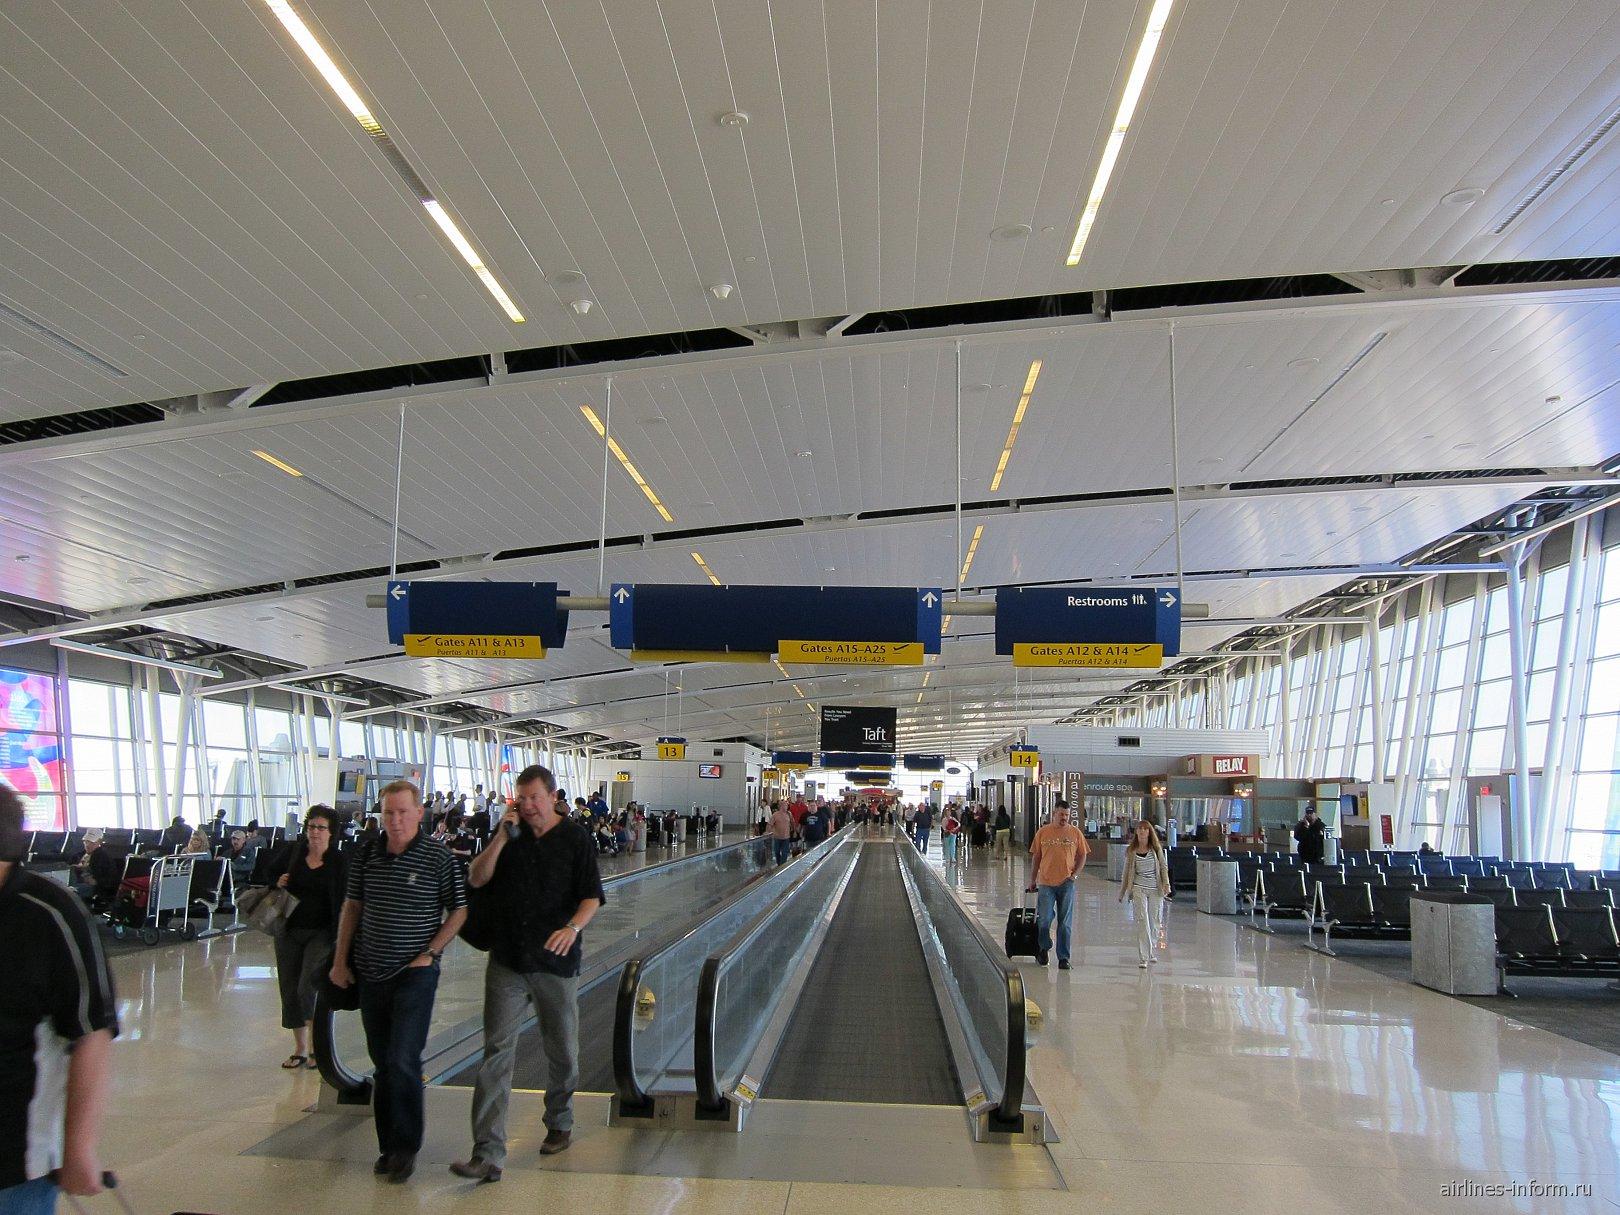 Зал с выходами на посадку в аэропорту Индианаполиса